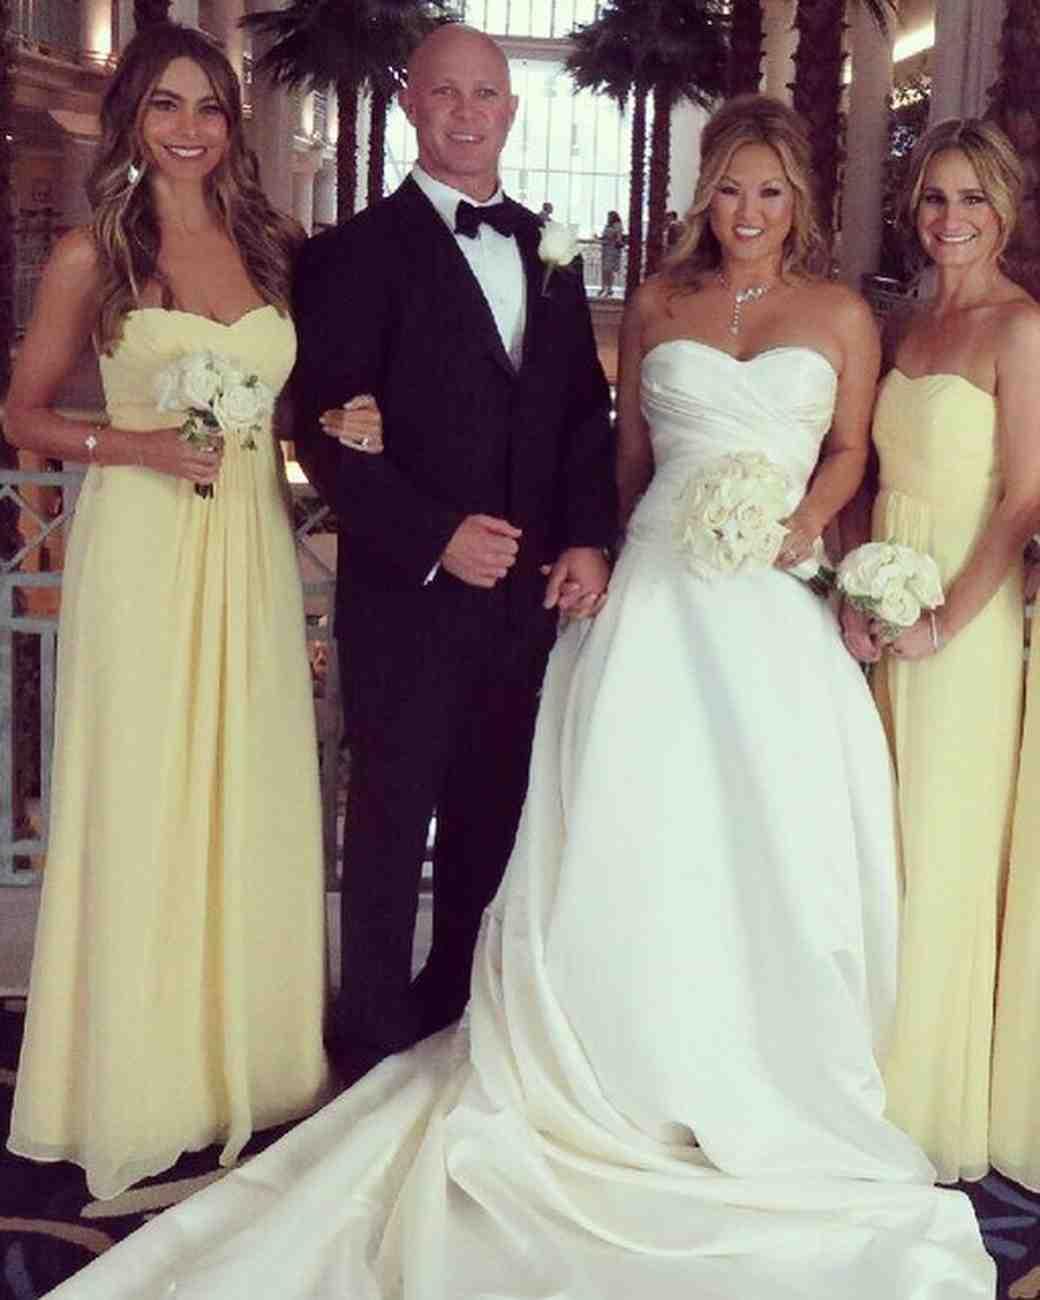 Sofia Vergara served as a bridesmaid at her friend's wedding